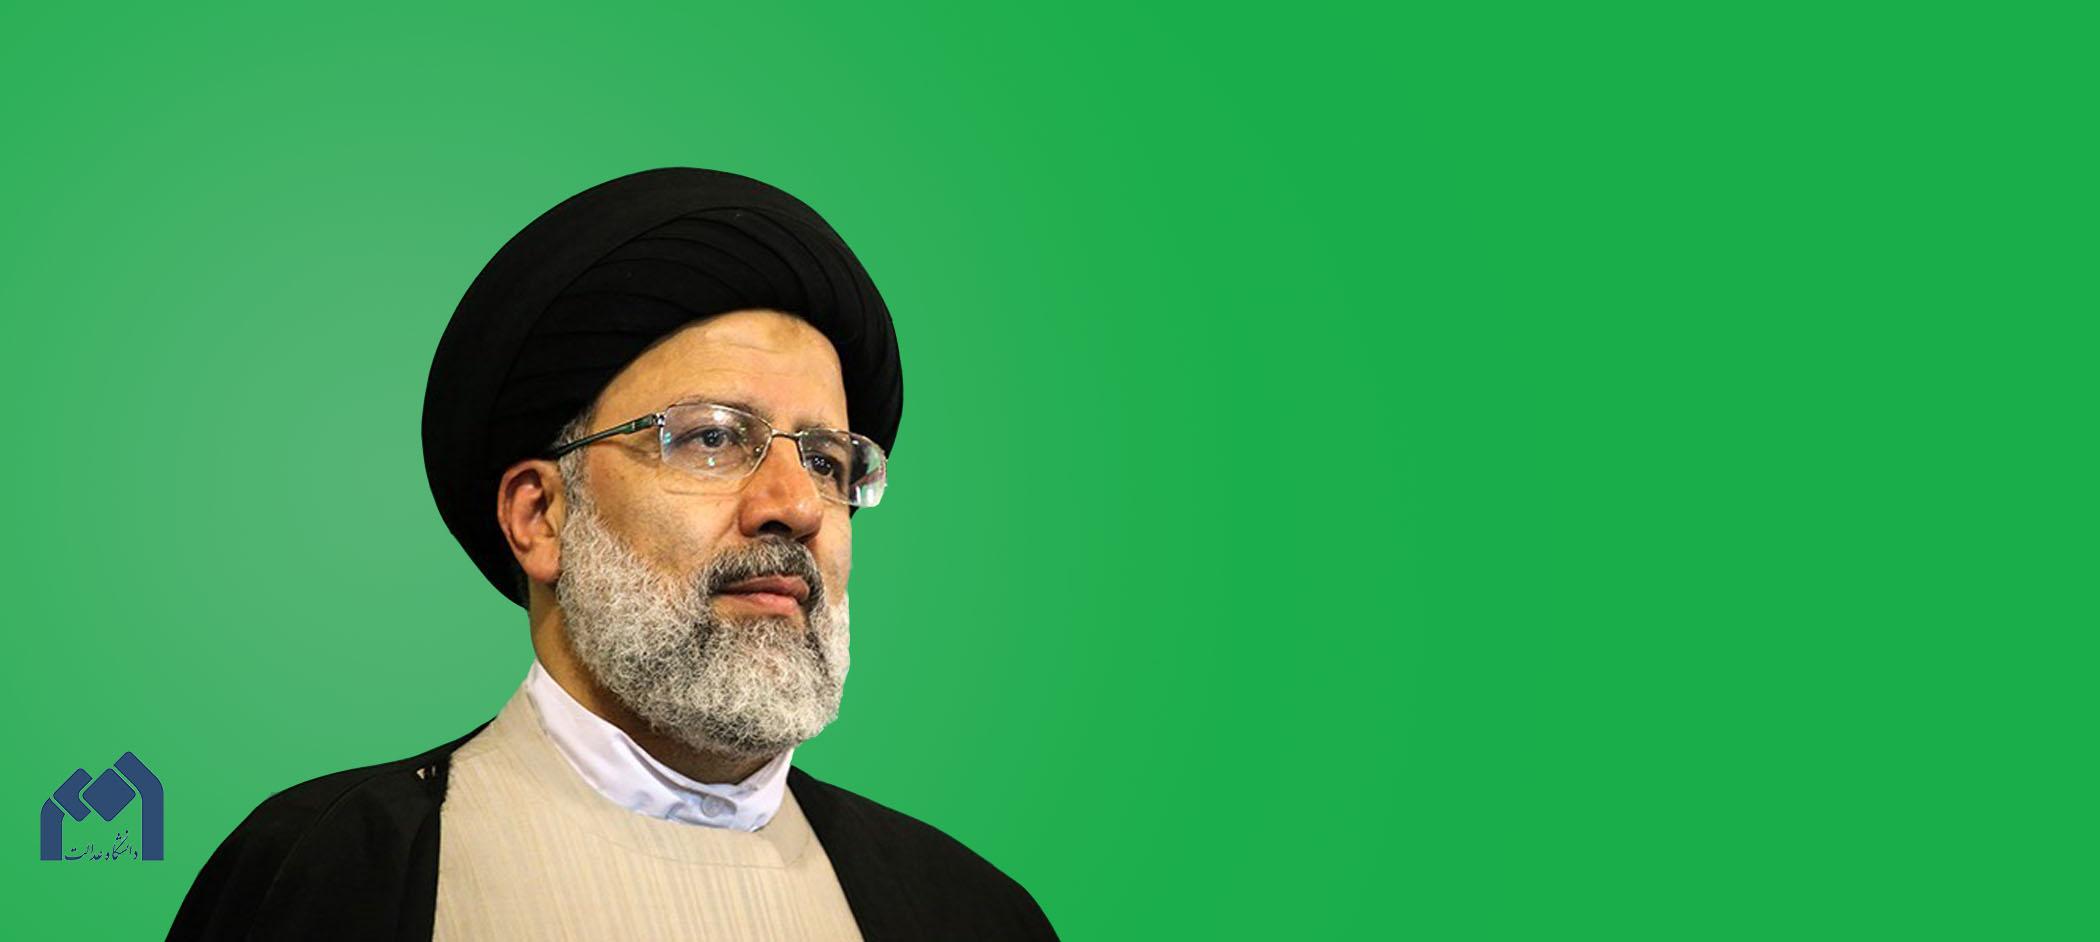 انتخاب آيت الله رئيسي بعنوان عضو هيات موسس دانشگاه عدالت